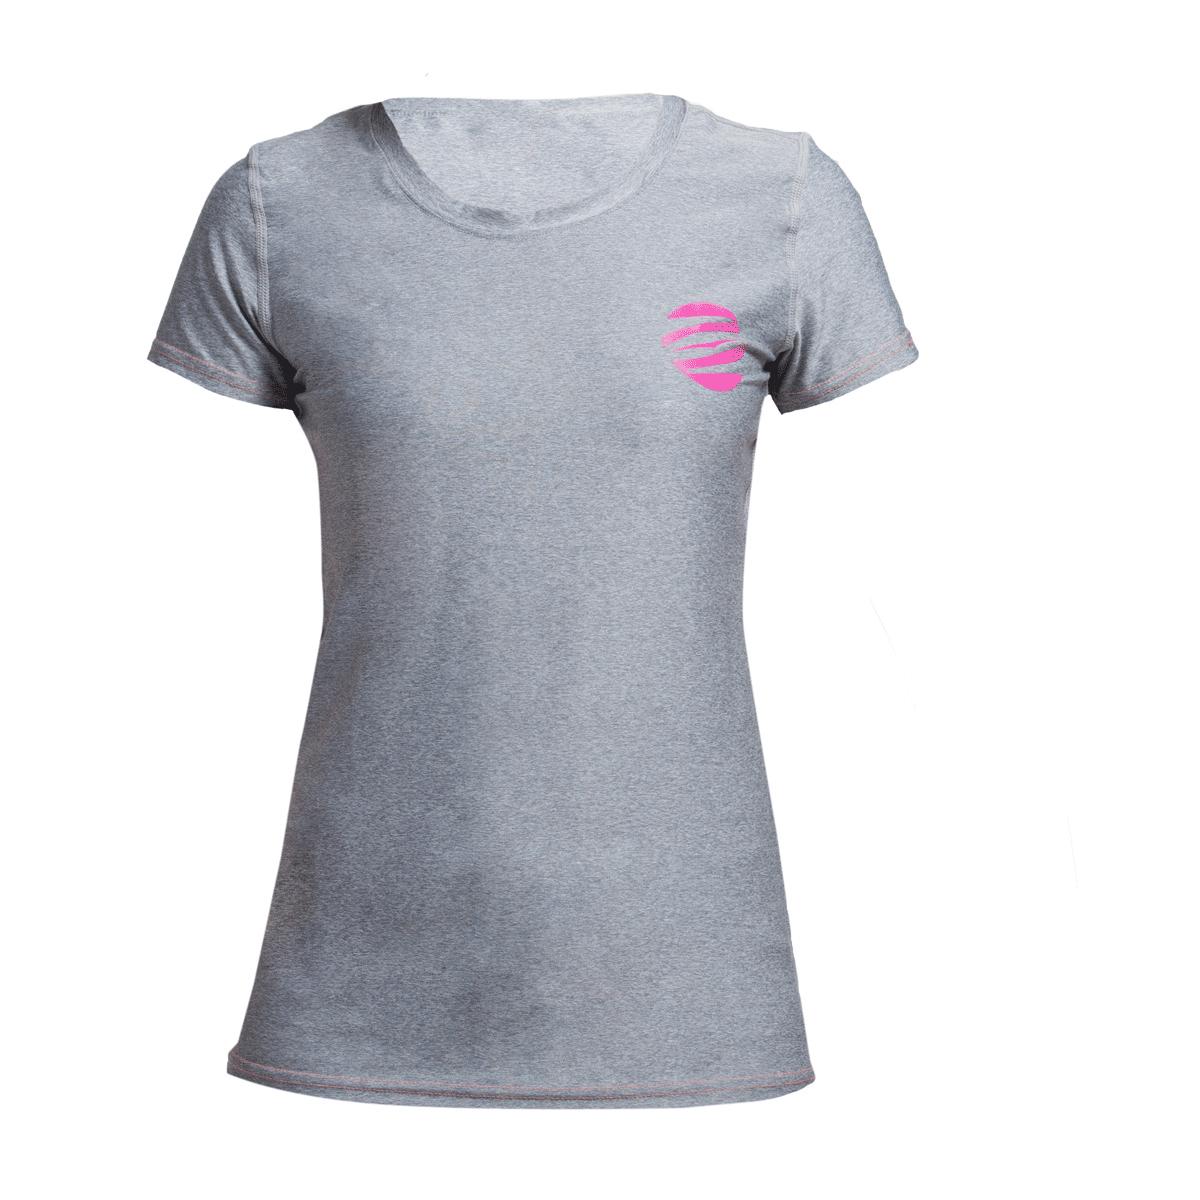 dámské lycrové tričko GUL Rashvest RG0367 - 14